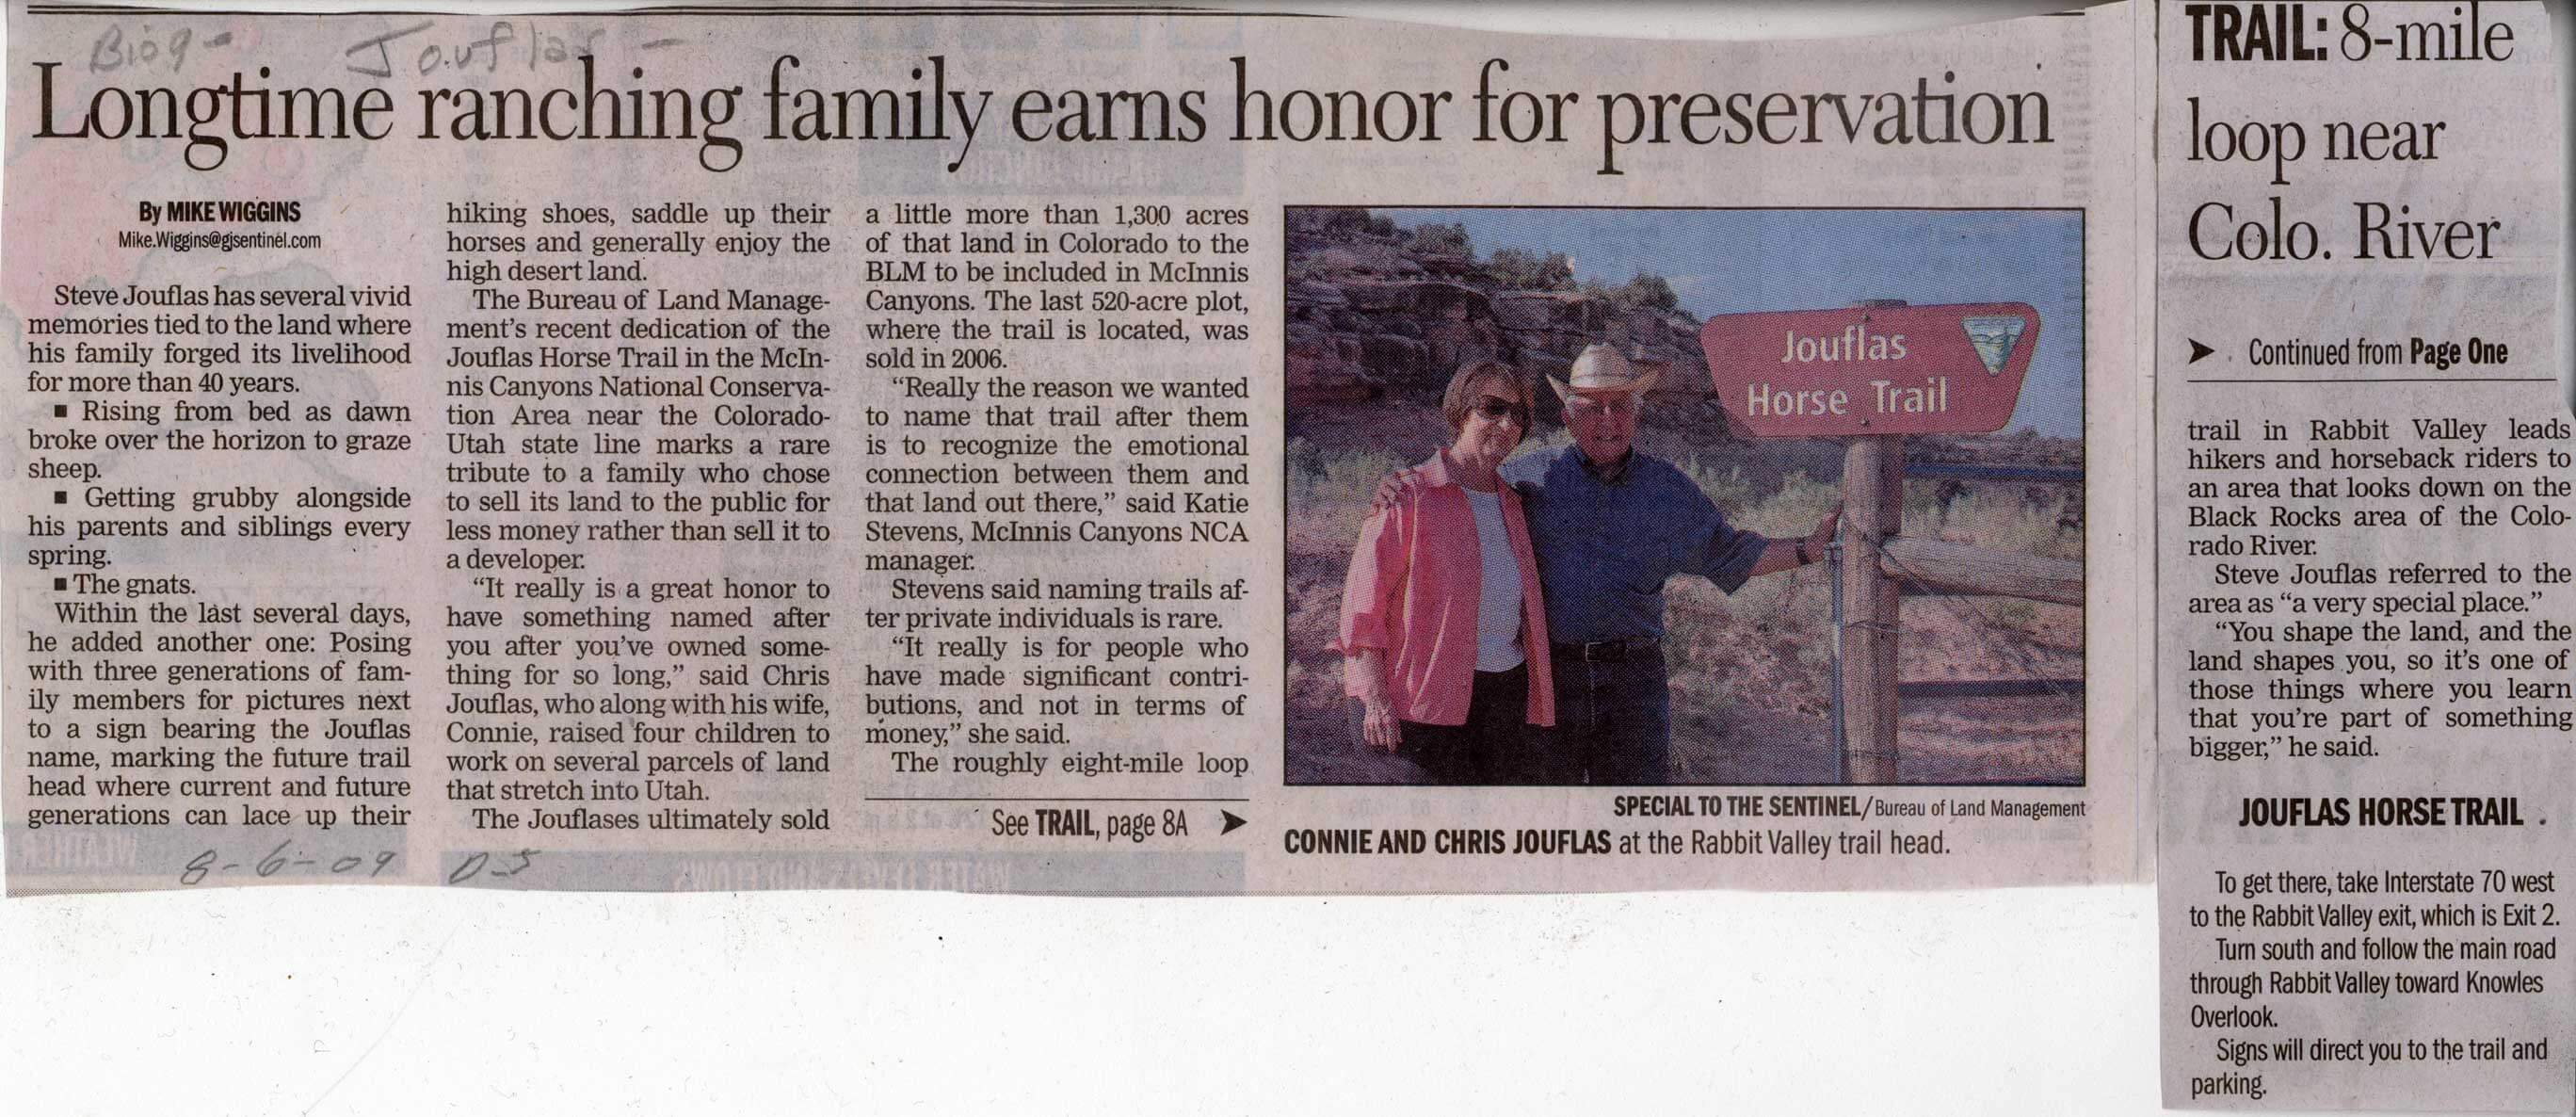 Jouflas Horse Trail Article